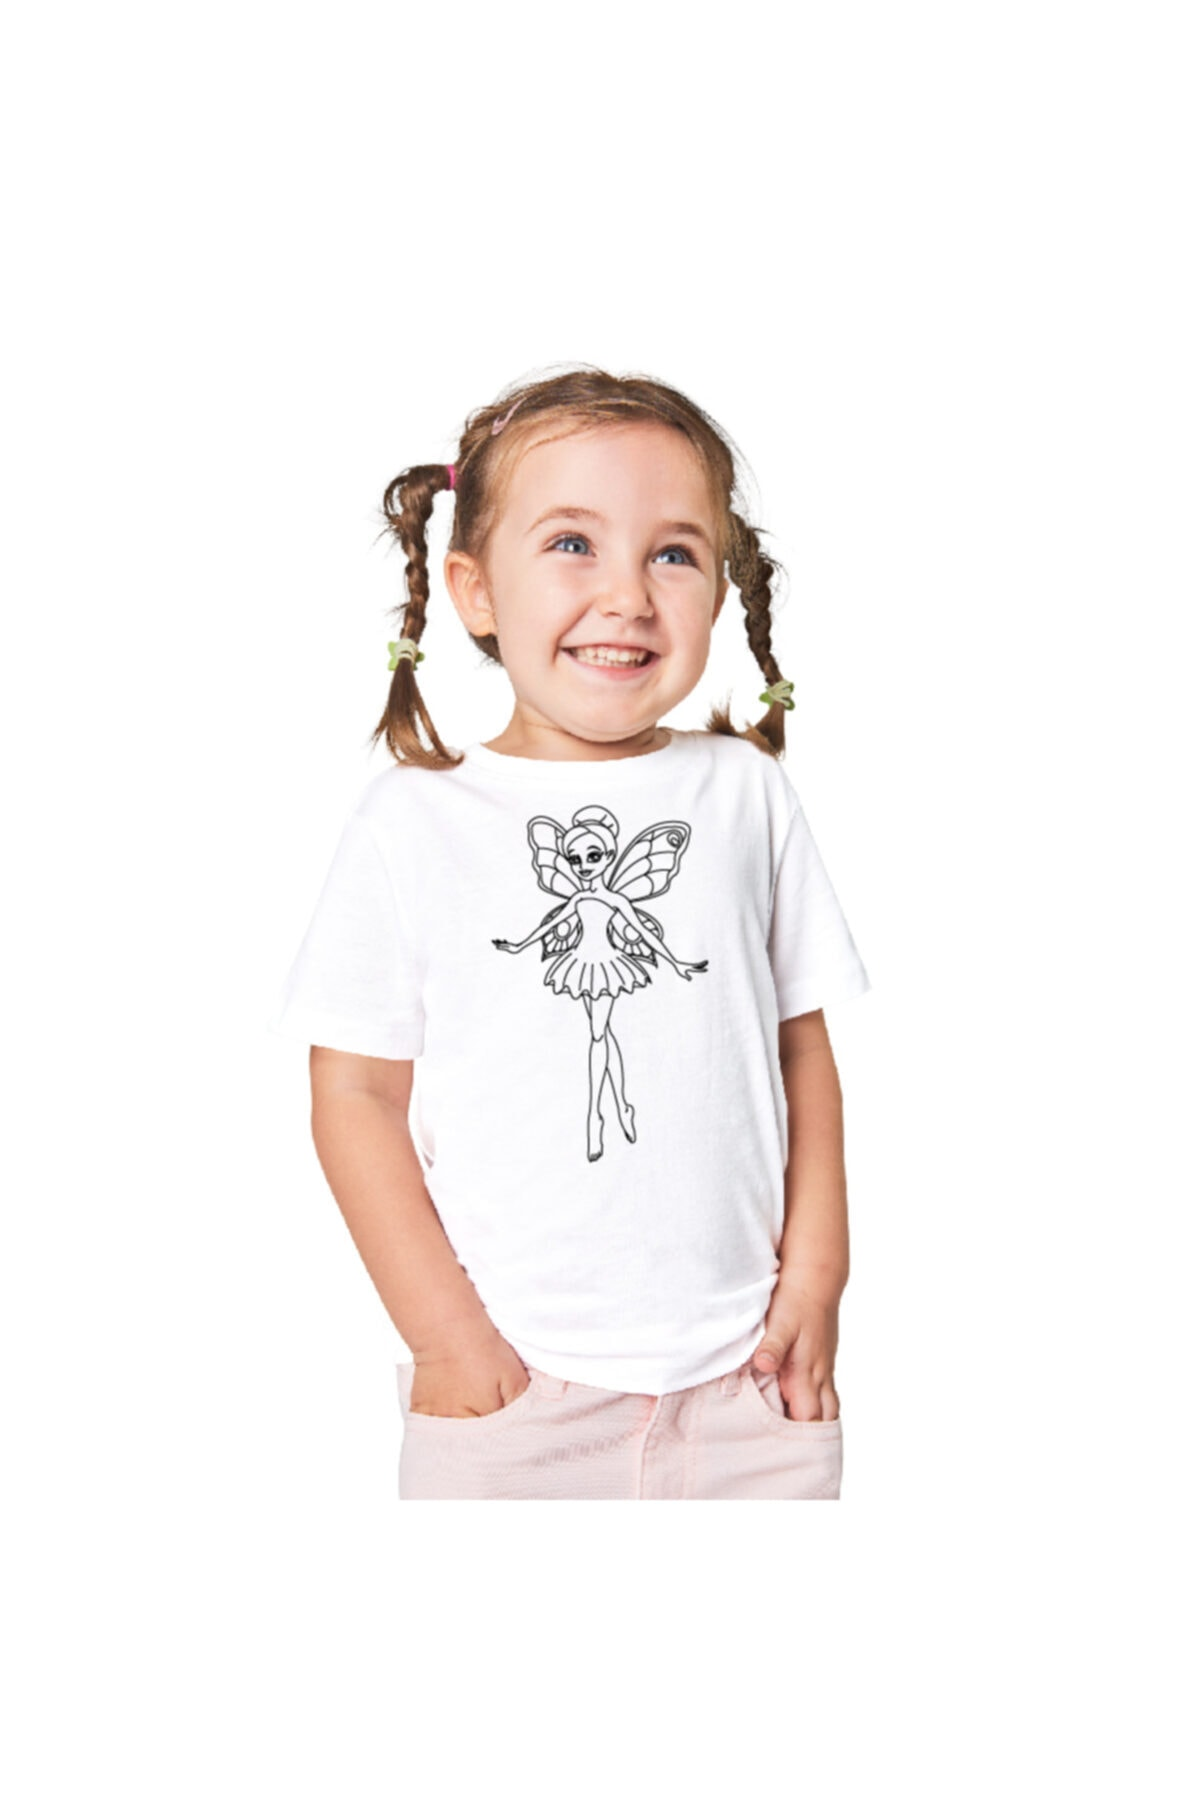 paint-wear Peri Boyama T-shirt 9-11 Yaş 2